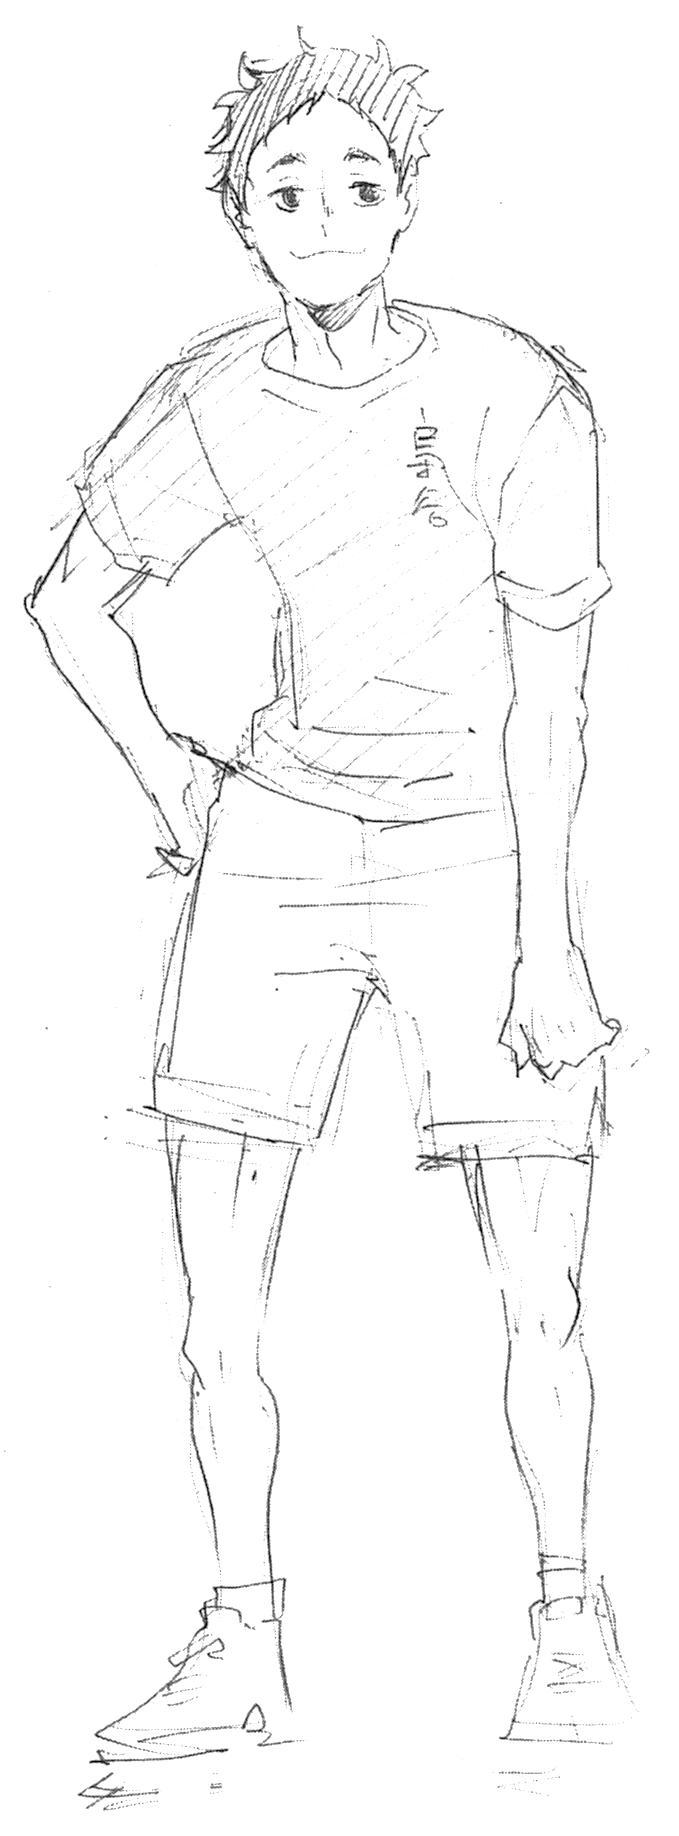 Yamato Sarukui Sketch.png